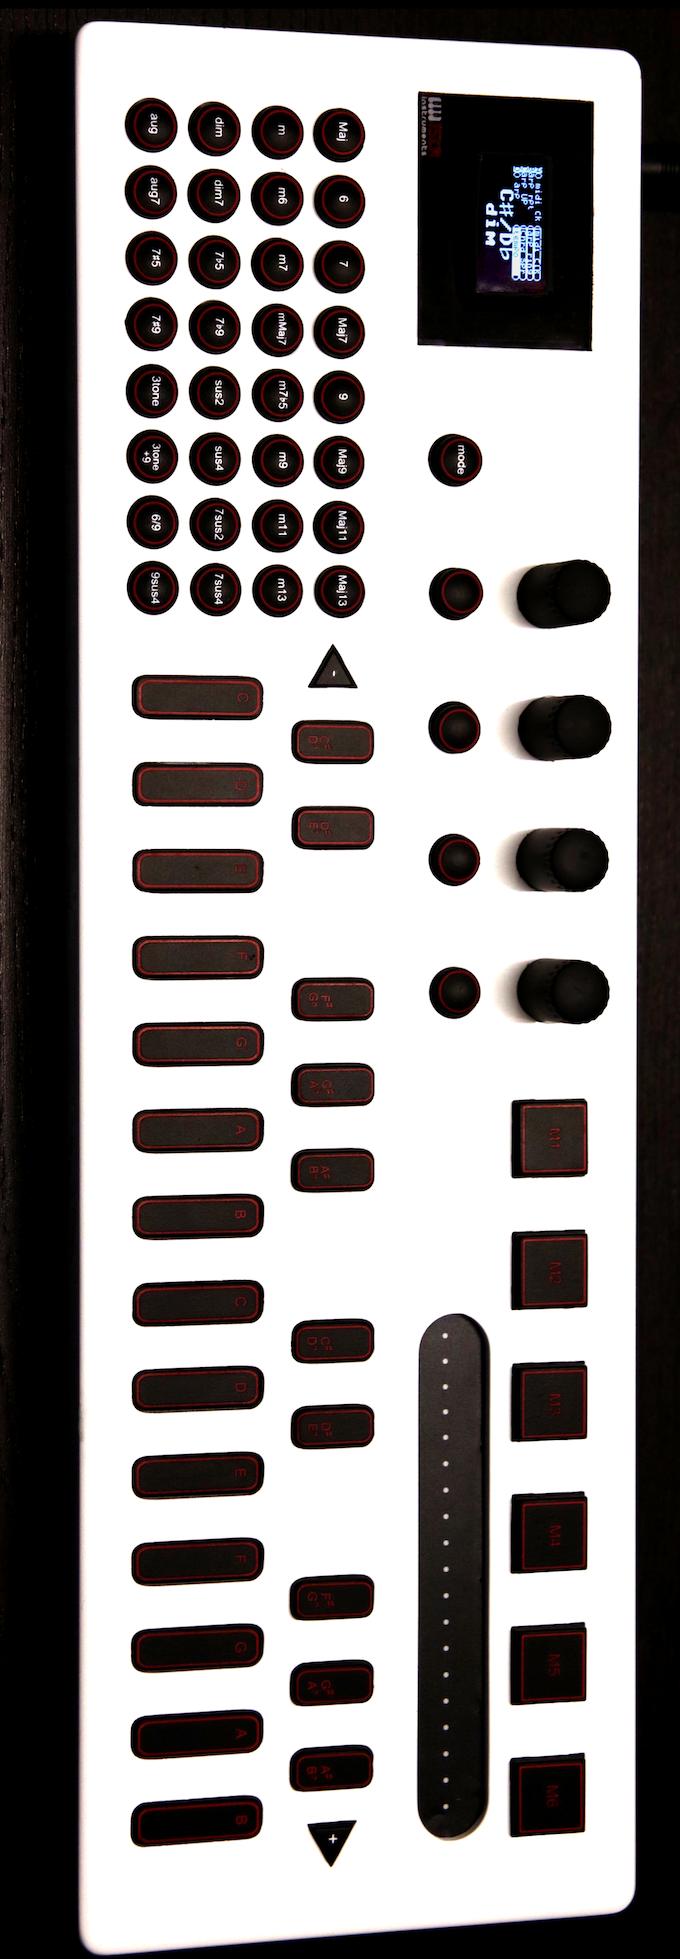 Kordbot Music Production Assistant By Isla Instruments Llc